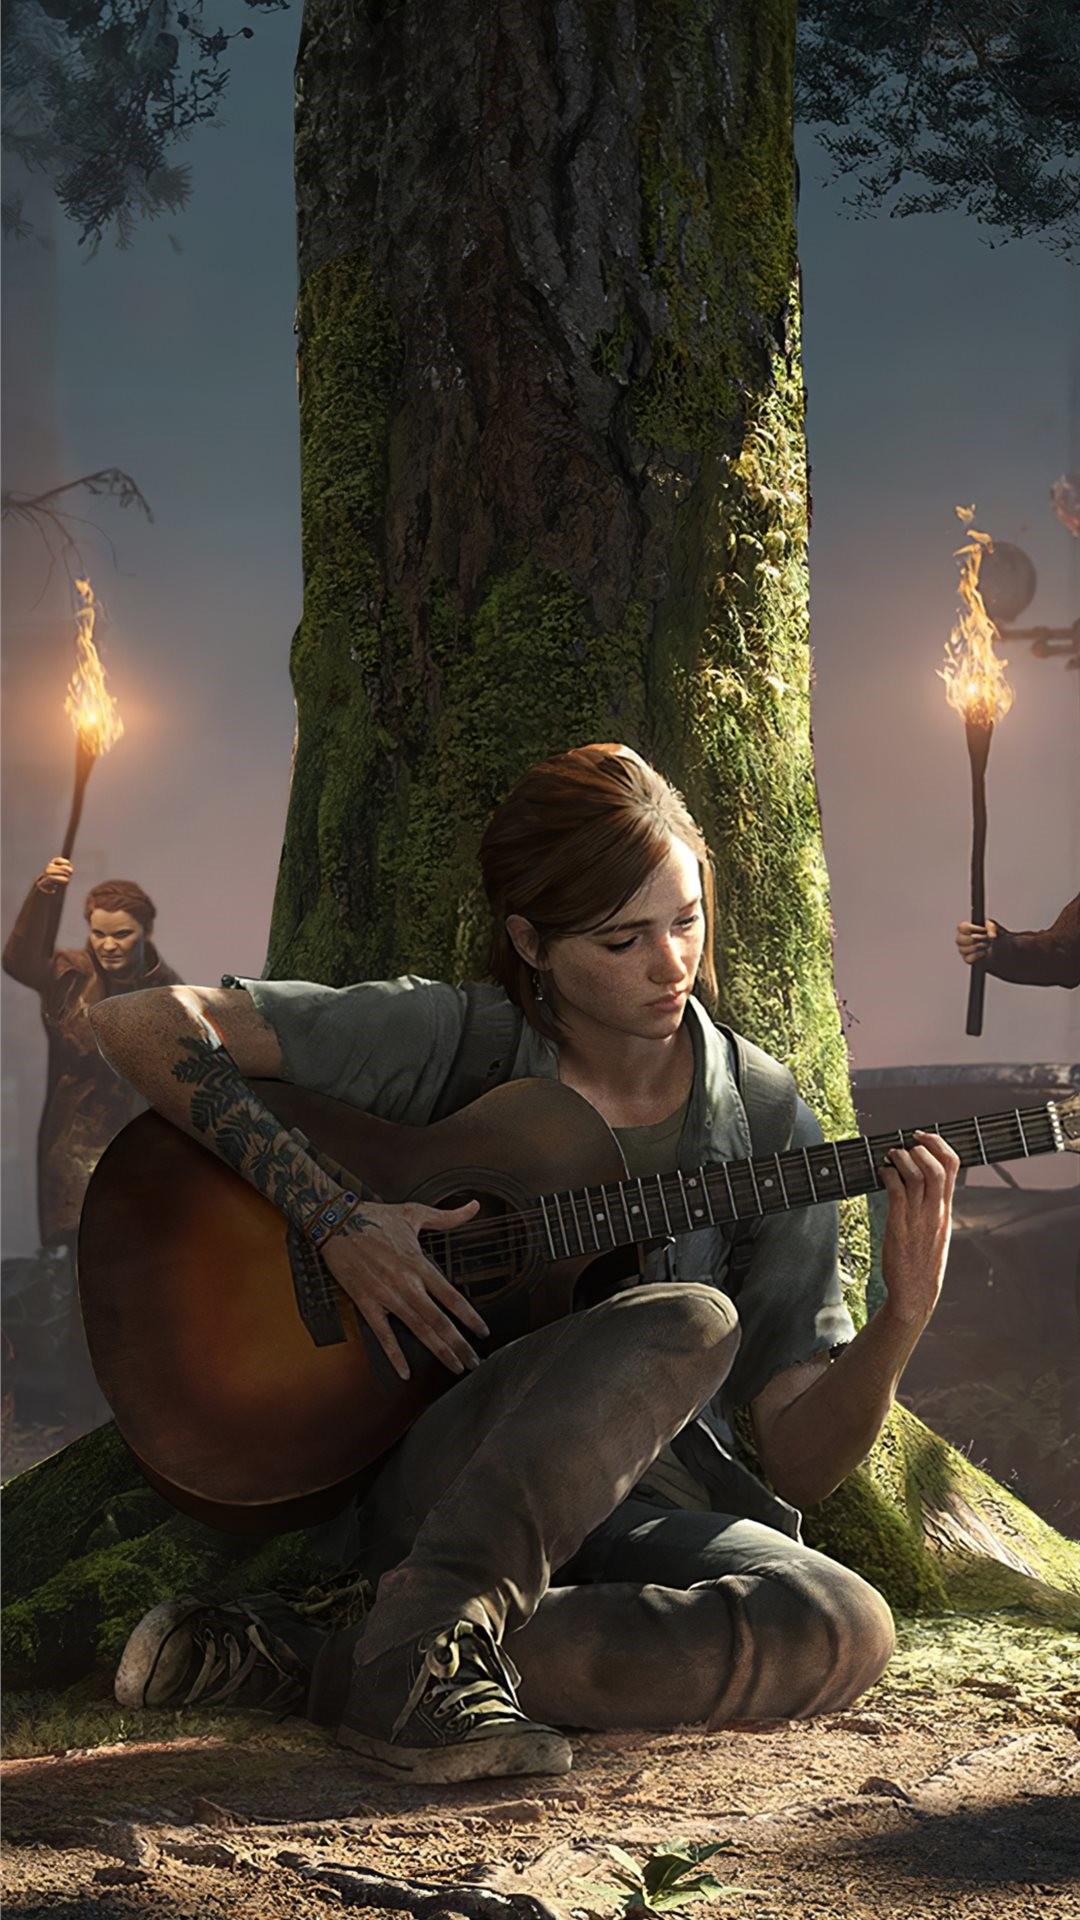 The Last Of Us phone wallpaper hd